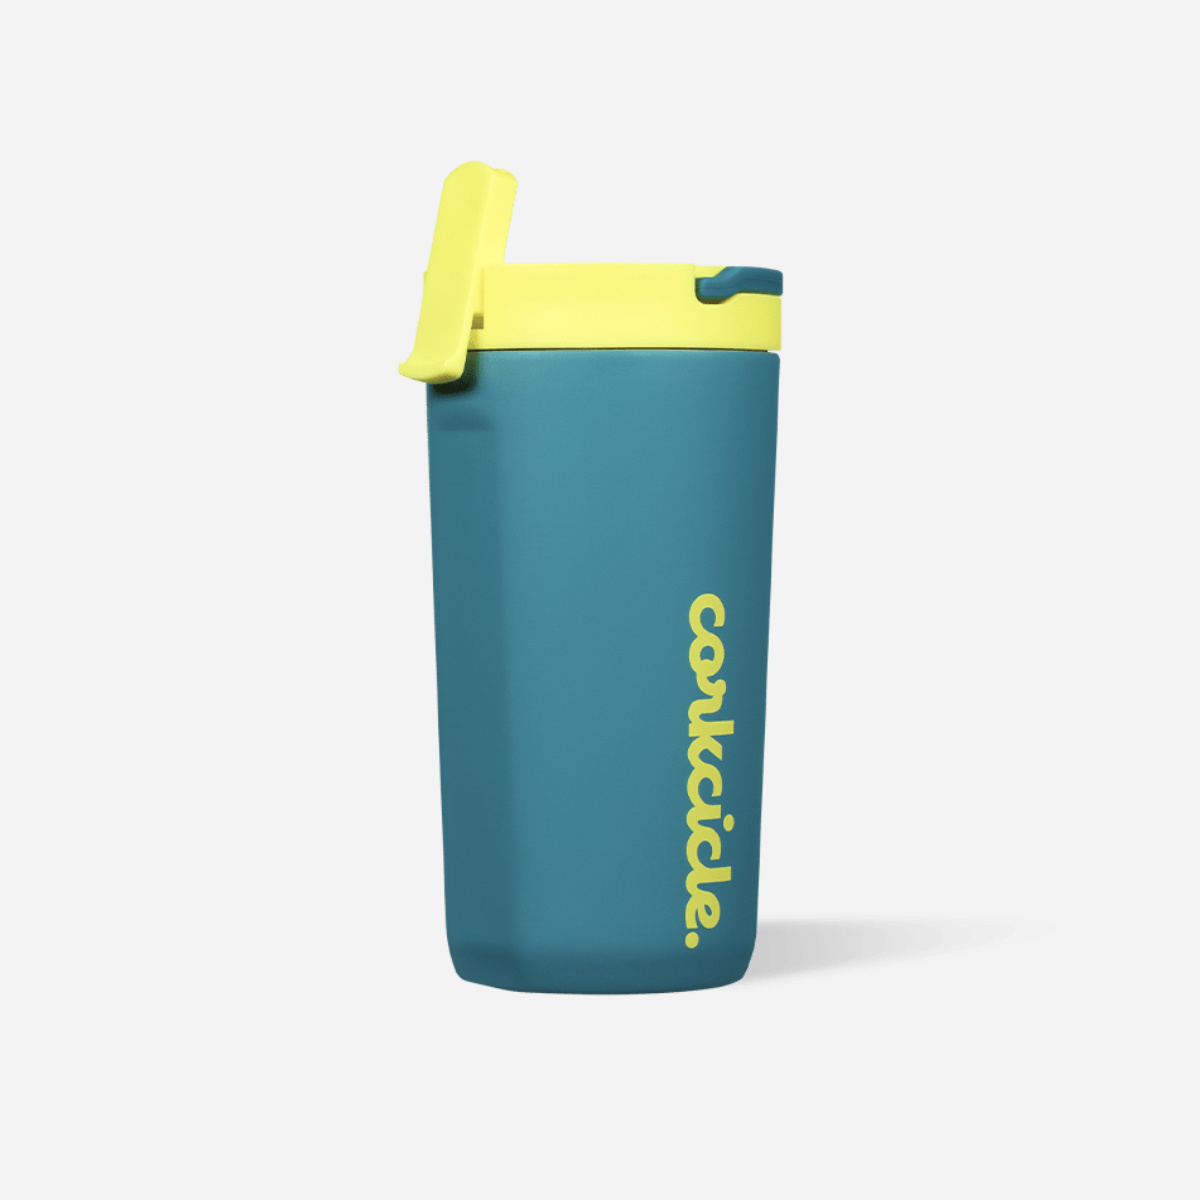 Corkcicle - CO Corkcicle - Electric Tide 12 oz. Kids Cup